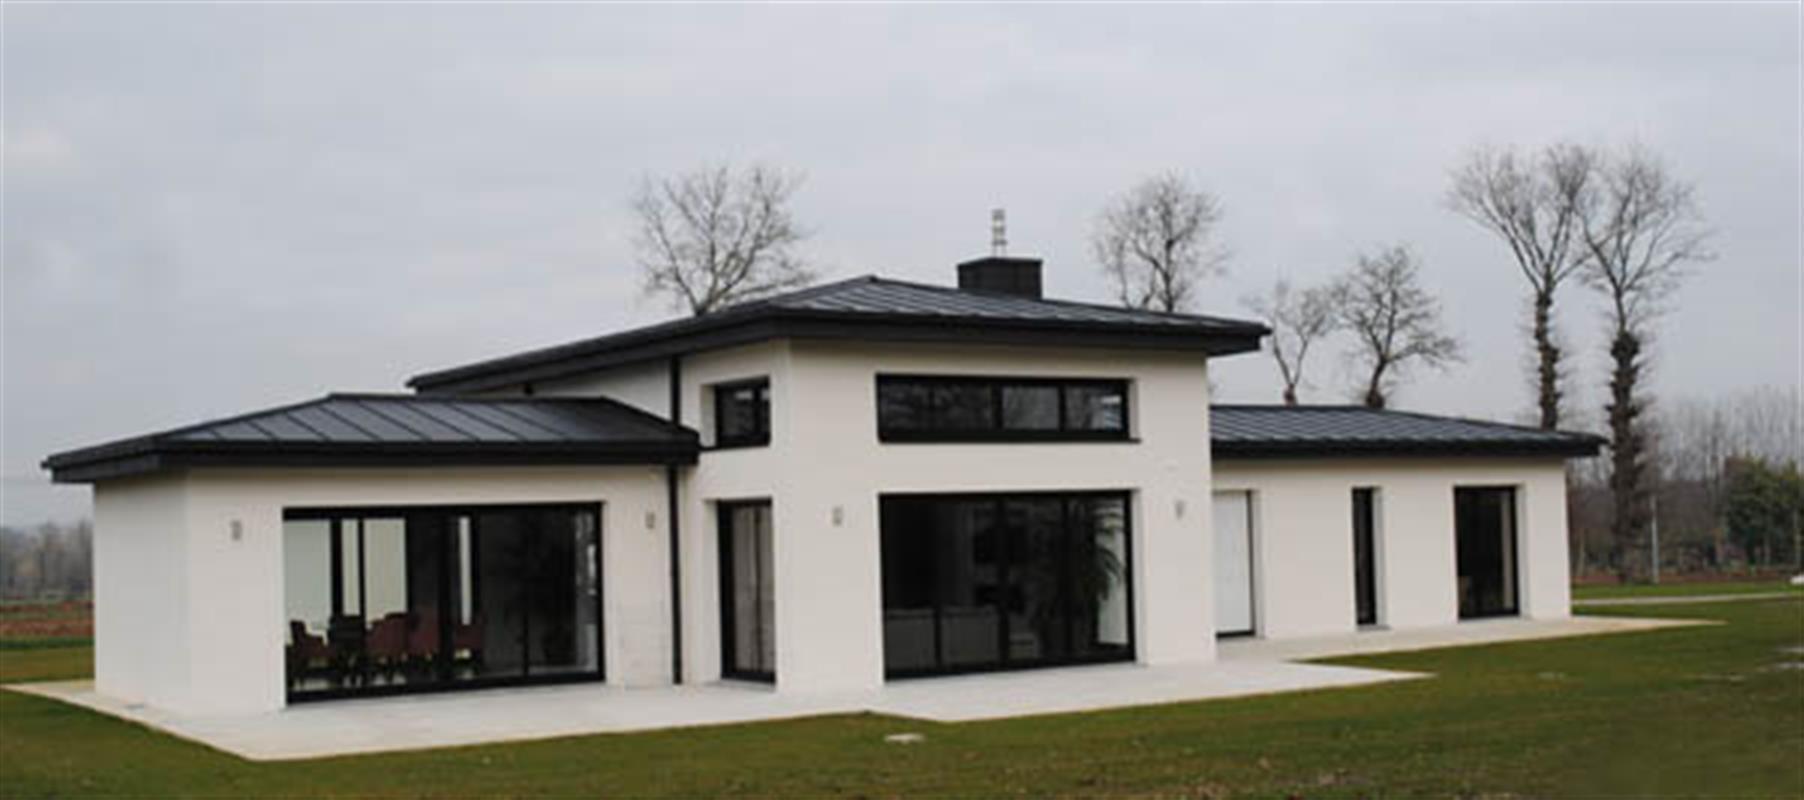 Architecte maison contemporaine bretagne ventana blog - Maison bretonne moderne ...